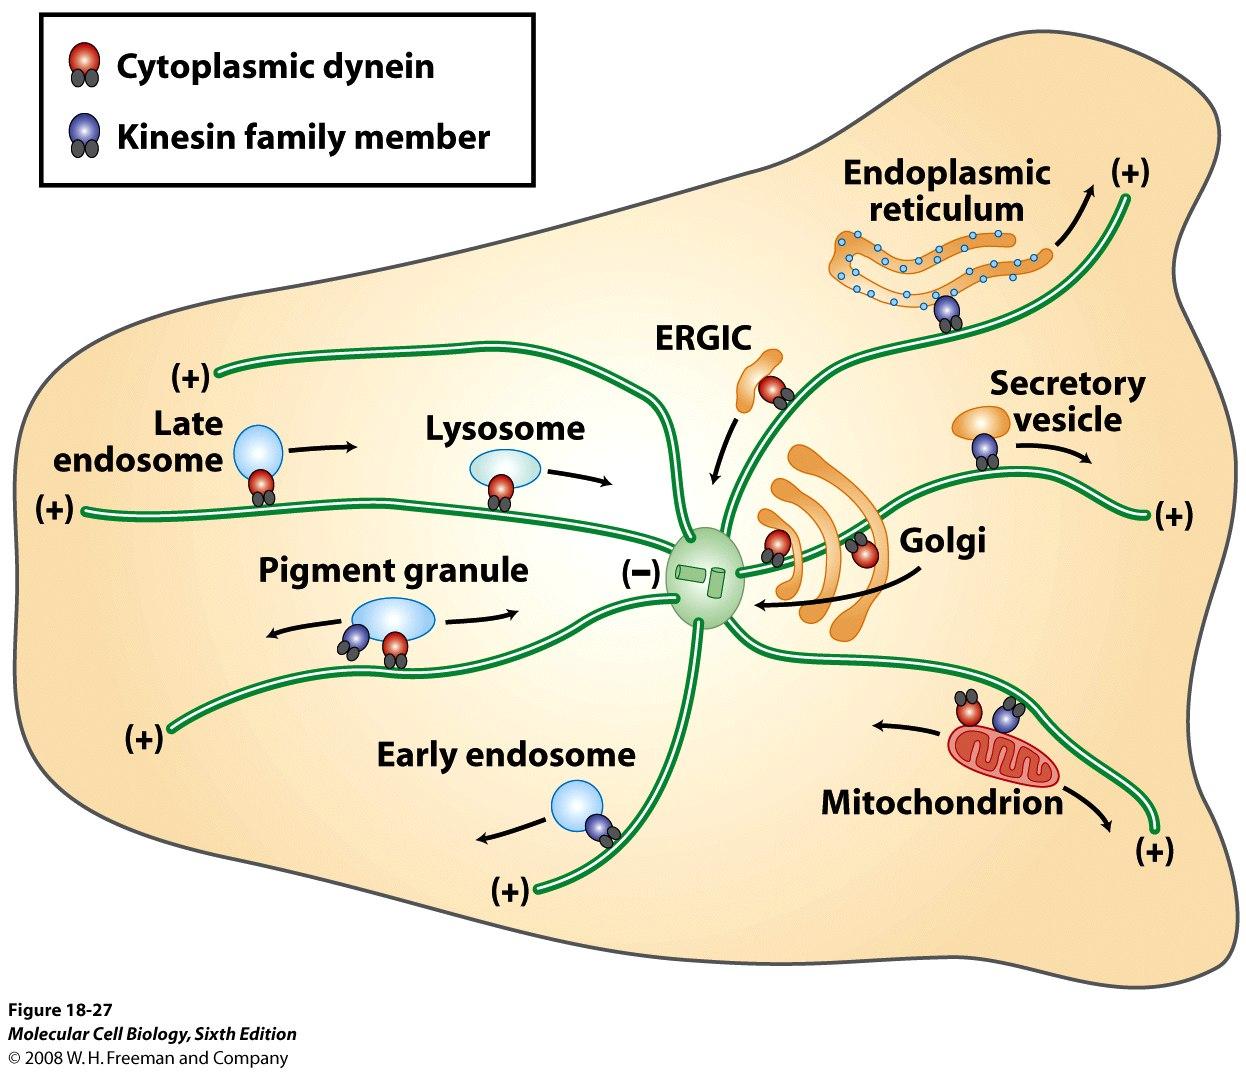 Microtubule animal cell